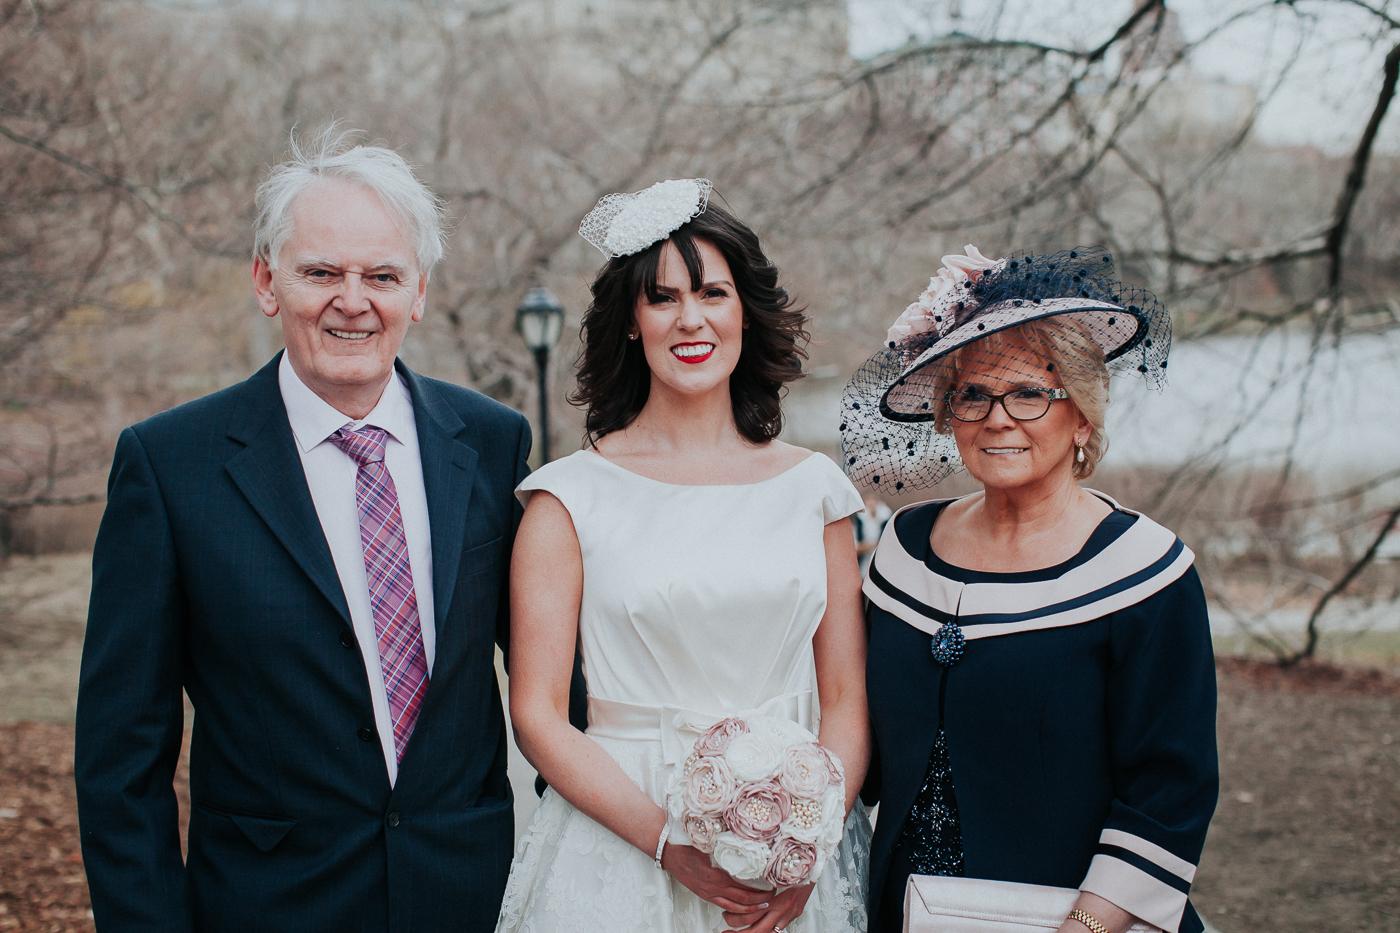 Ladies-Pavilion-Central-Park-NYC-Documentary-Elopement-Wedding-Photographer-48.jpg